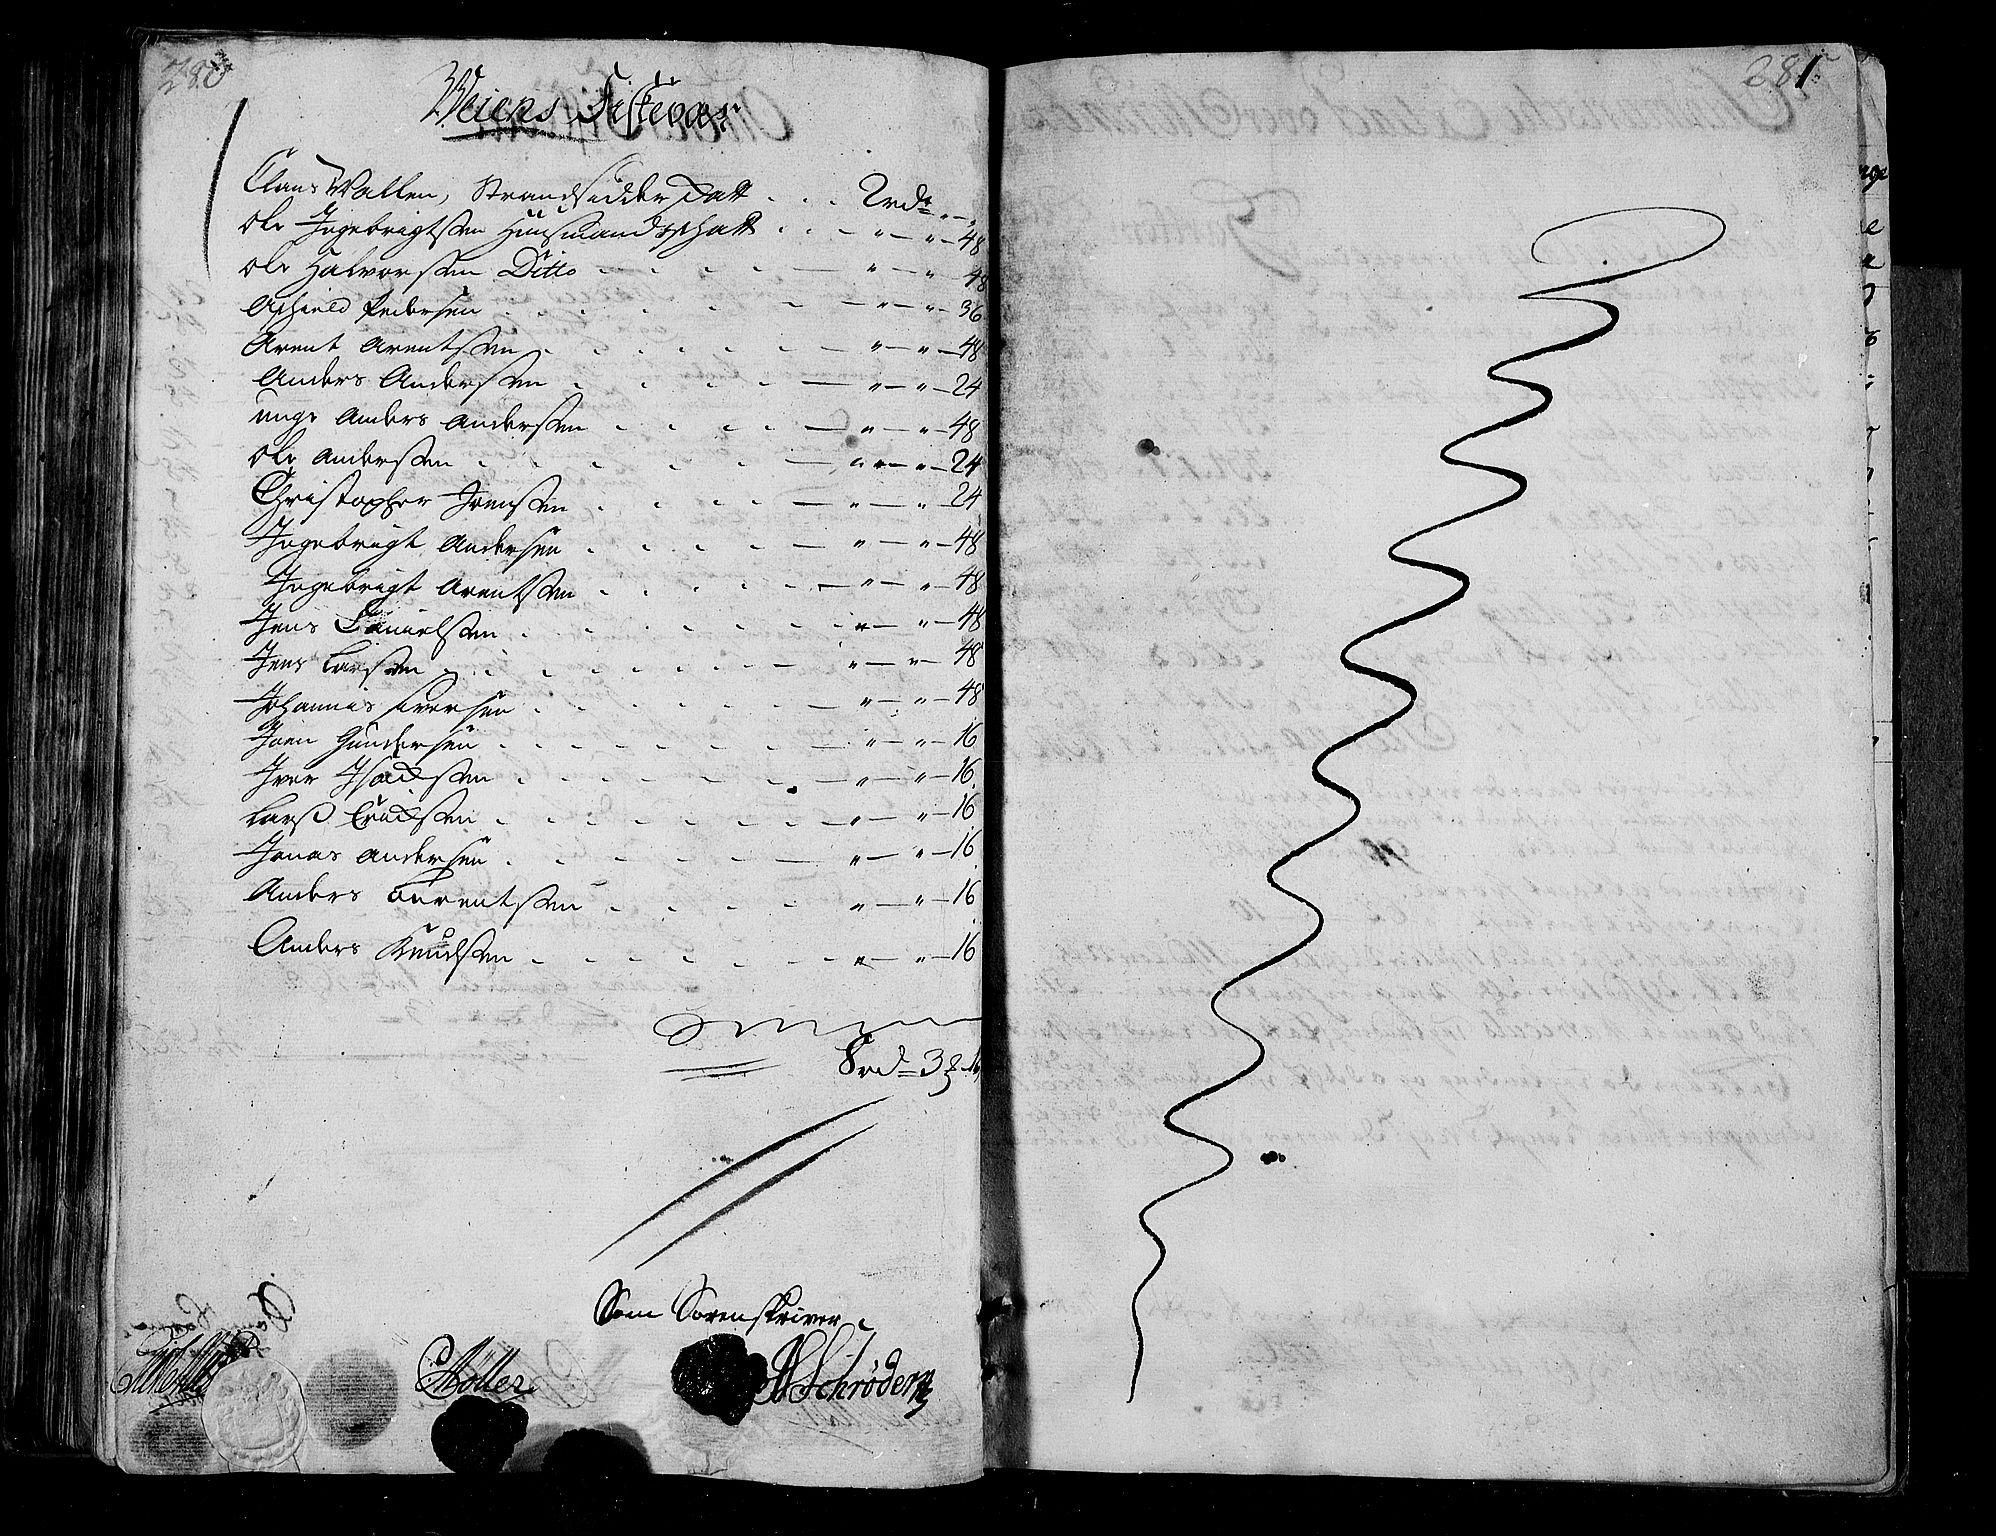 RA, Rentekammeret inntil 1814, Realistisk ordnet avdeling, N/Nb/Nbf/L0155: Nordmøre matrikkelprotokoll, 1721-1723, s. 280-281